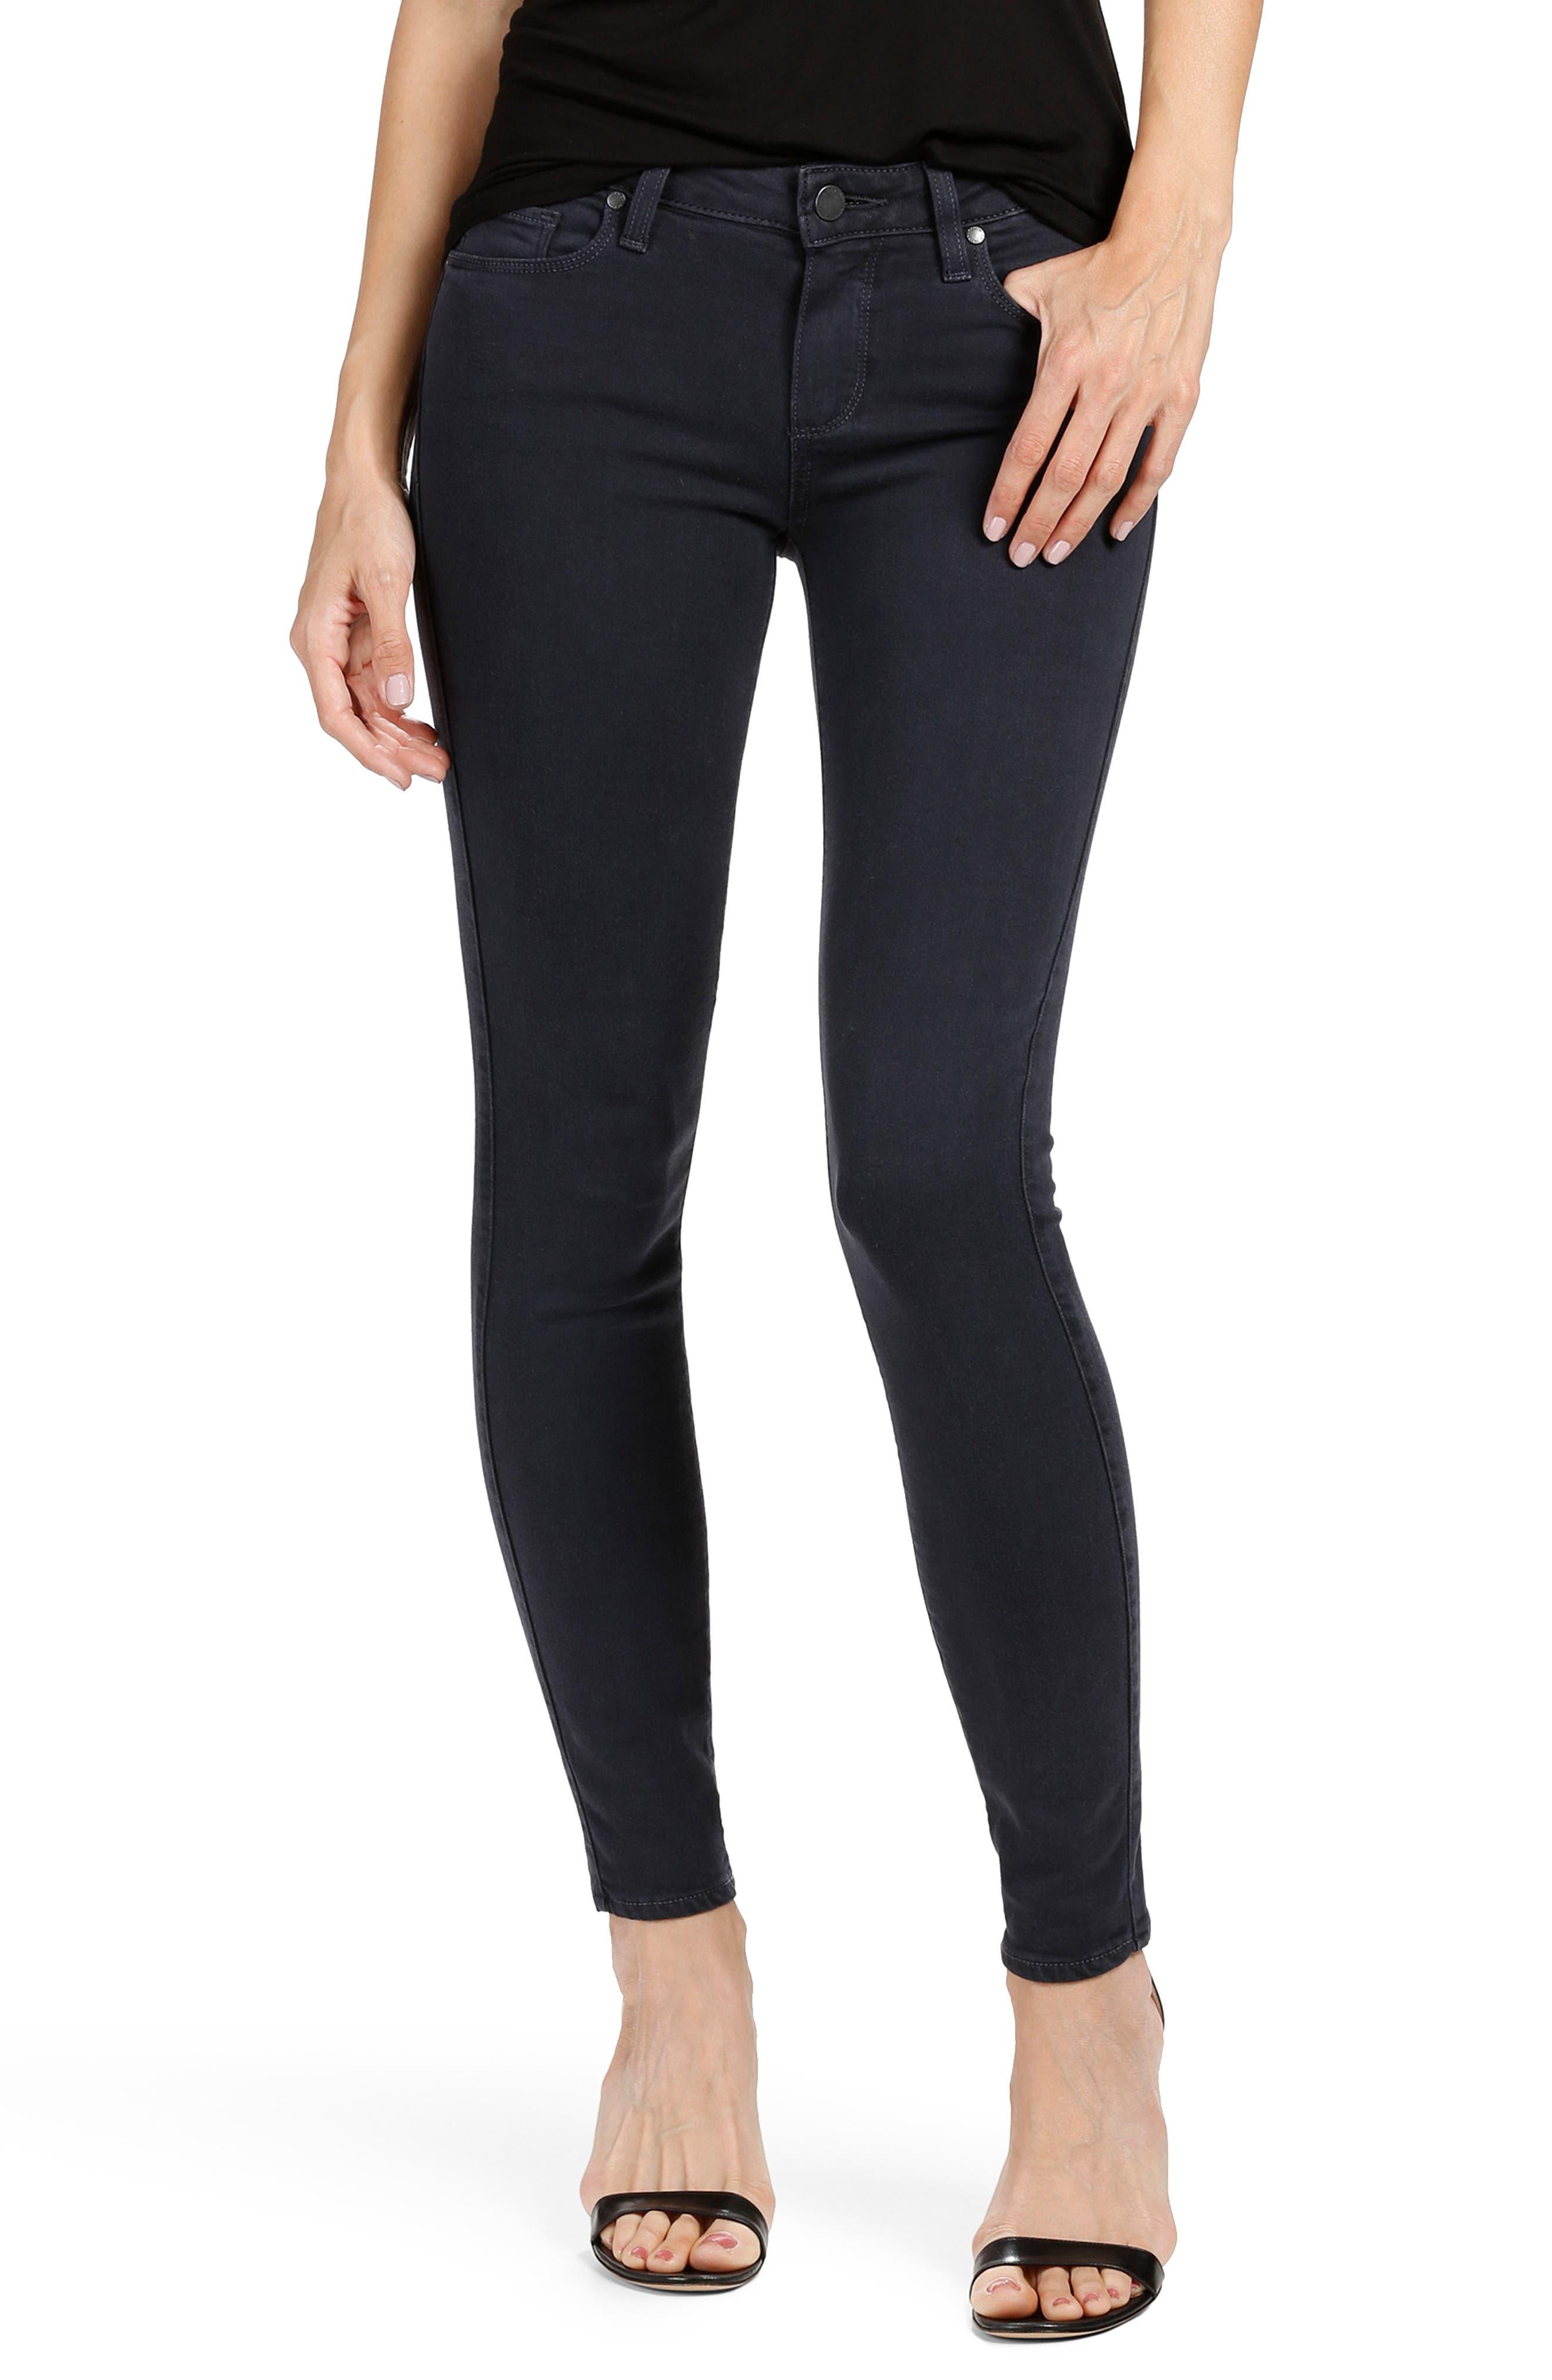 PAIGE Transcend - Verdugo Ankle Skinny Jeans (Navy Eclipse)